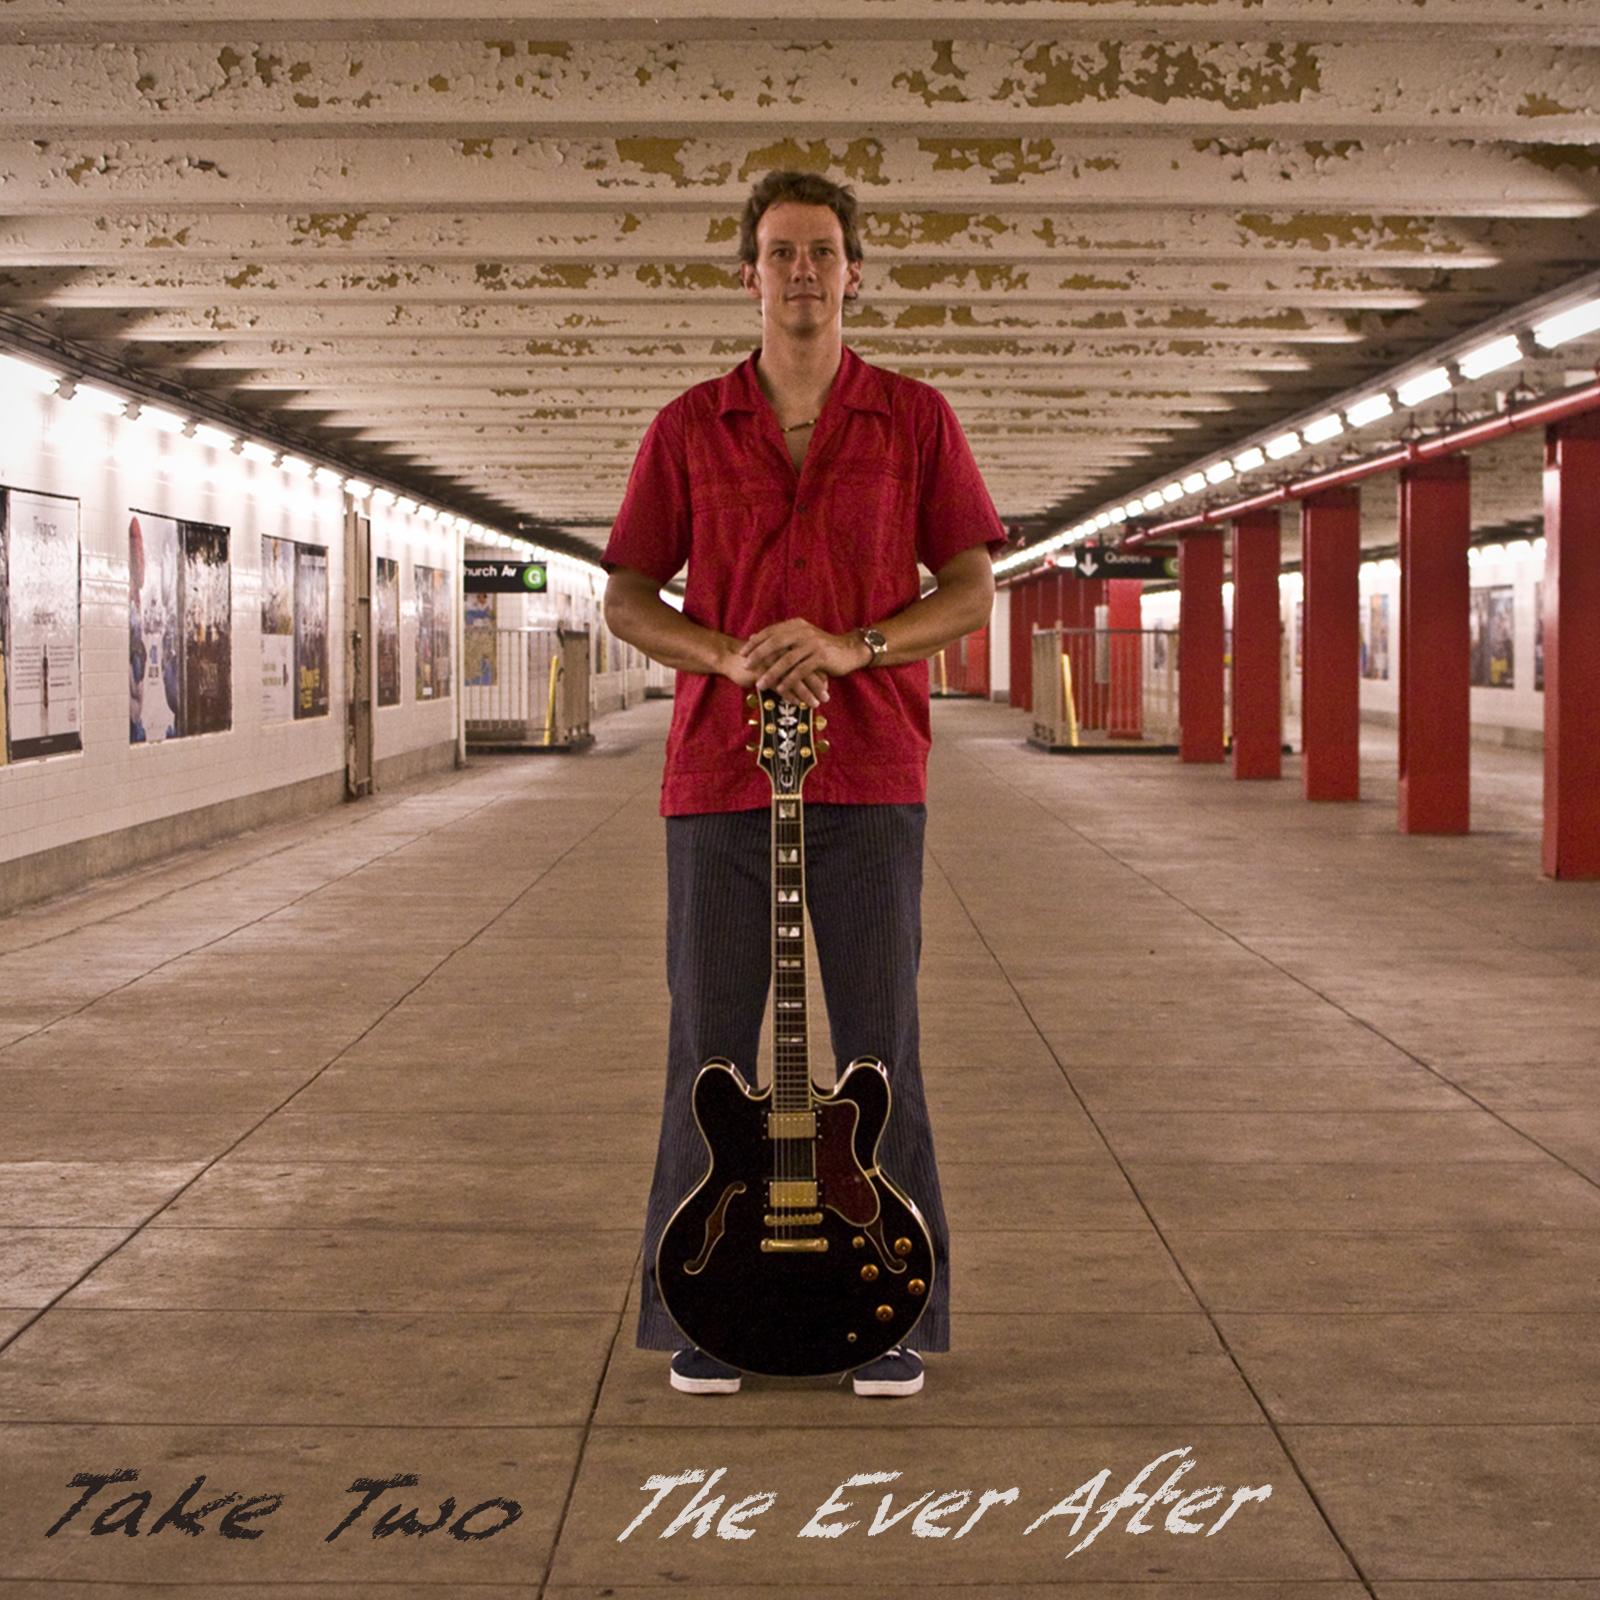 Take Two - Album Cover